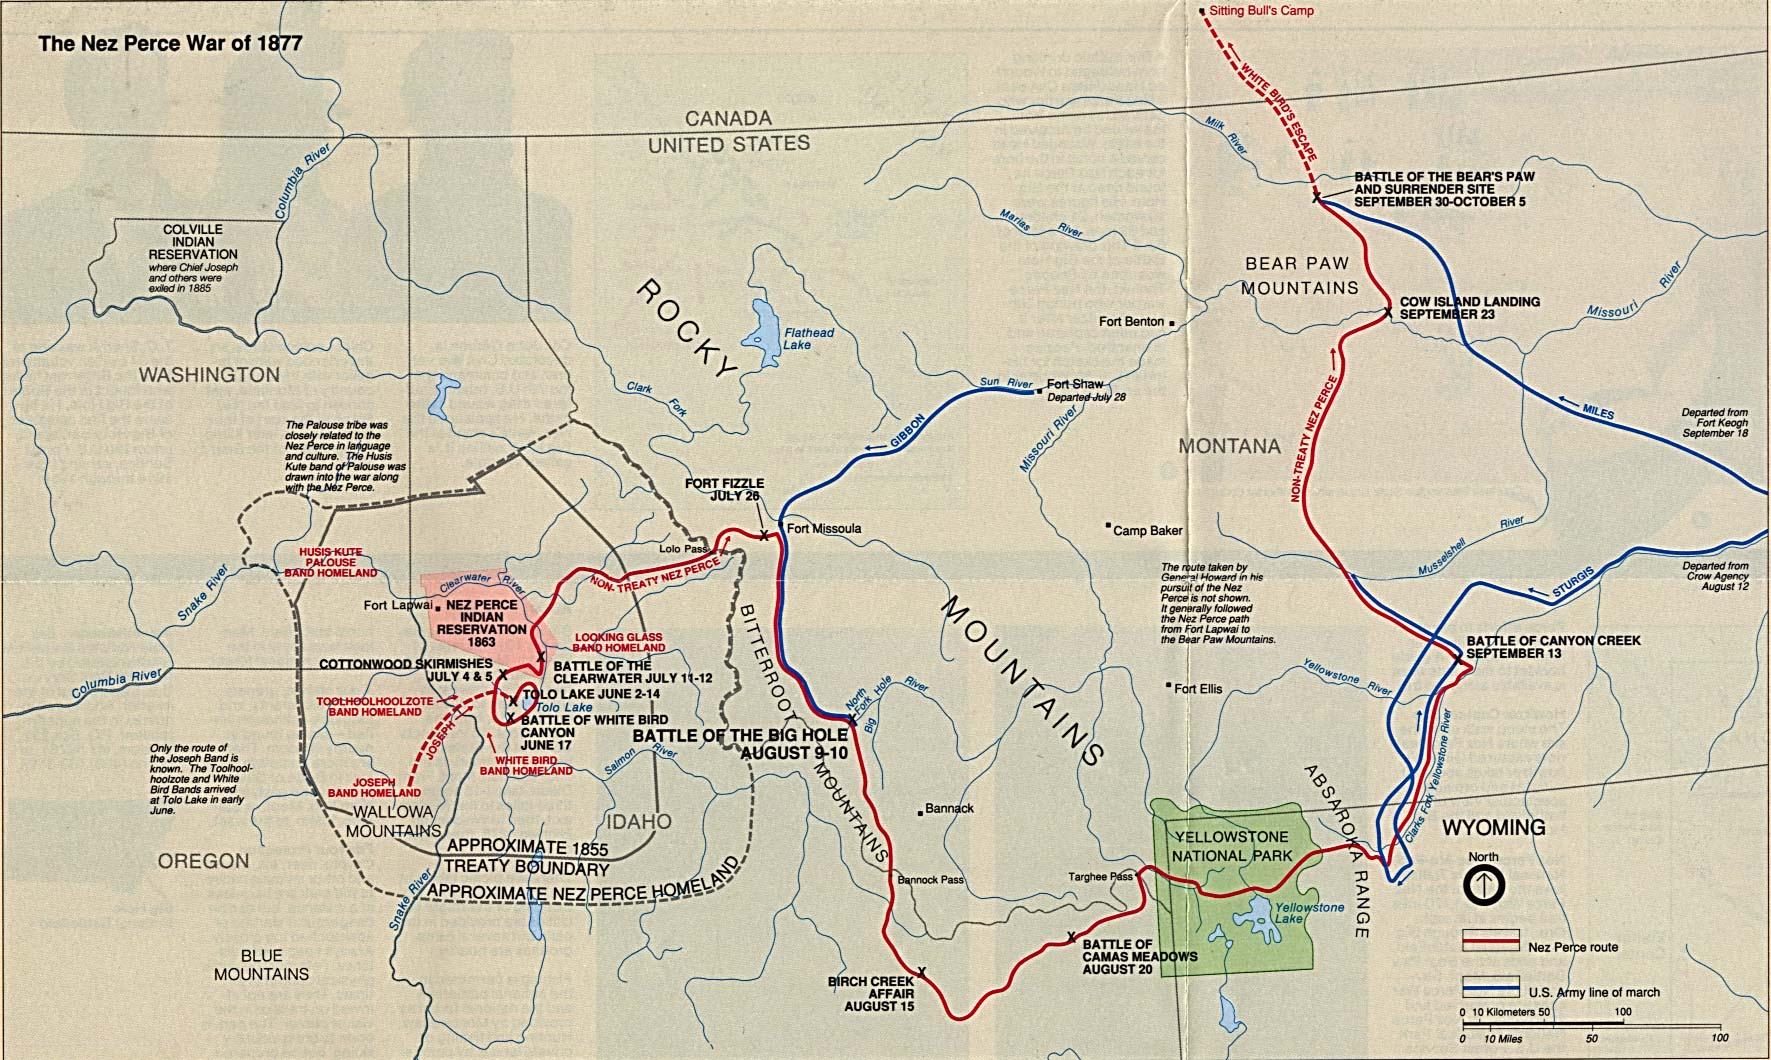 Free Download Montana National Park Maps